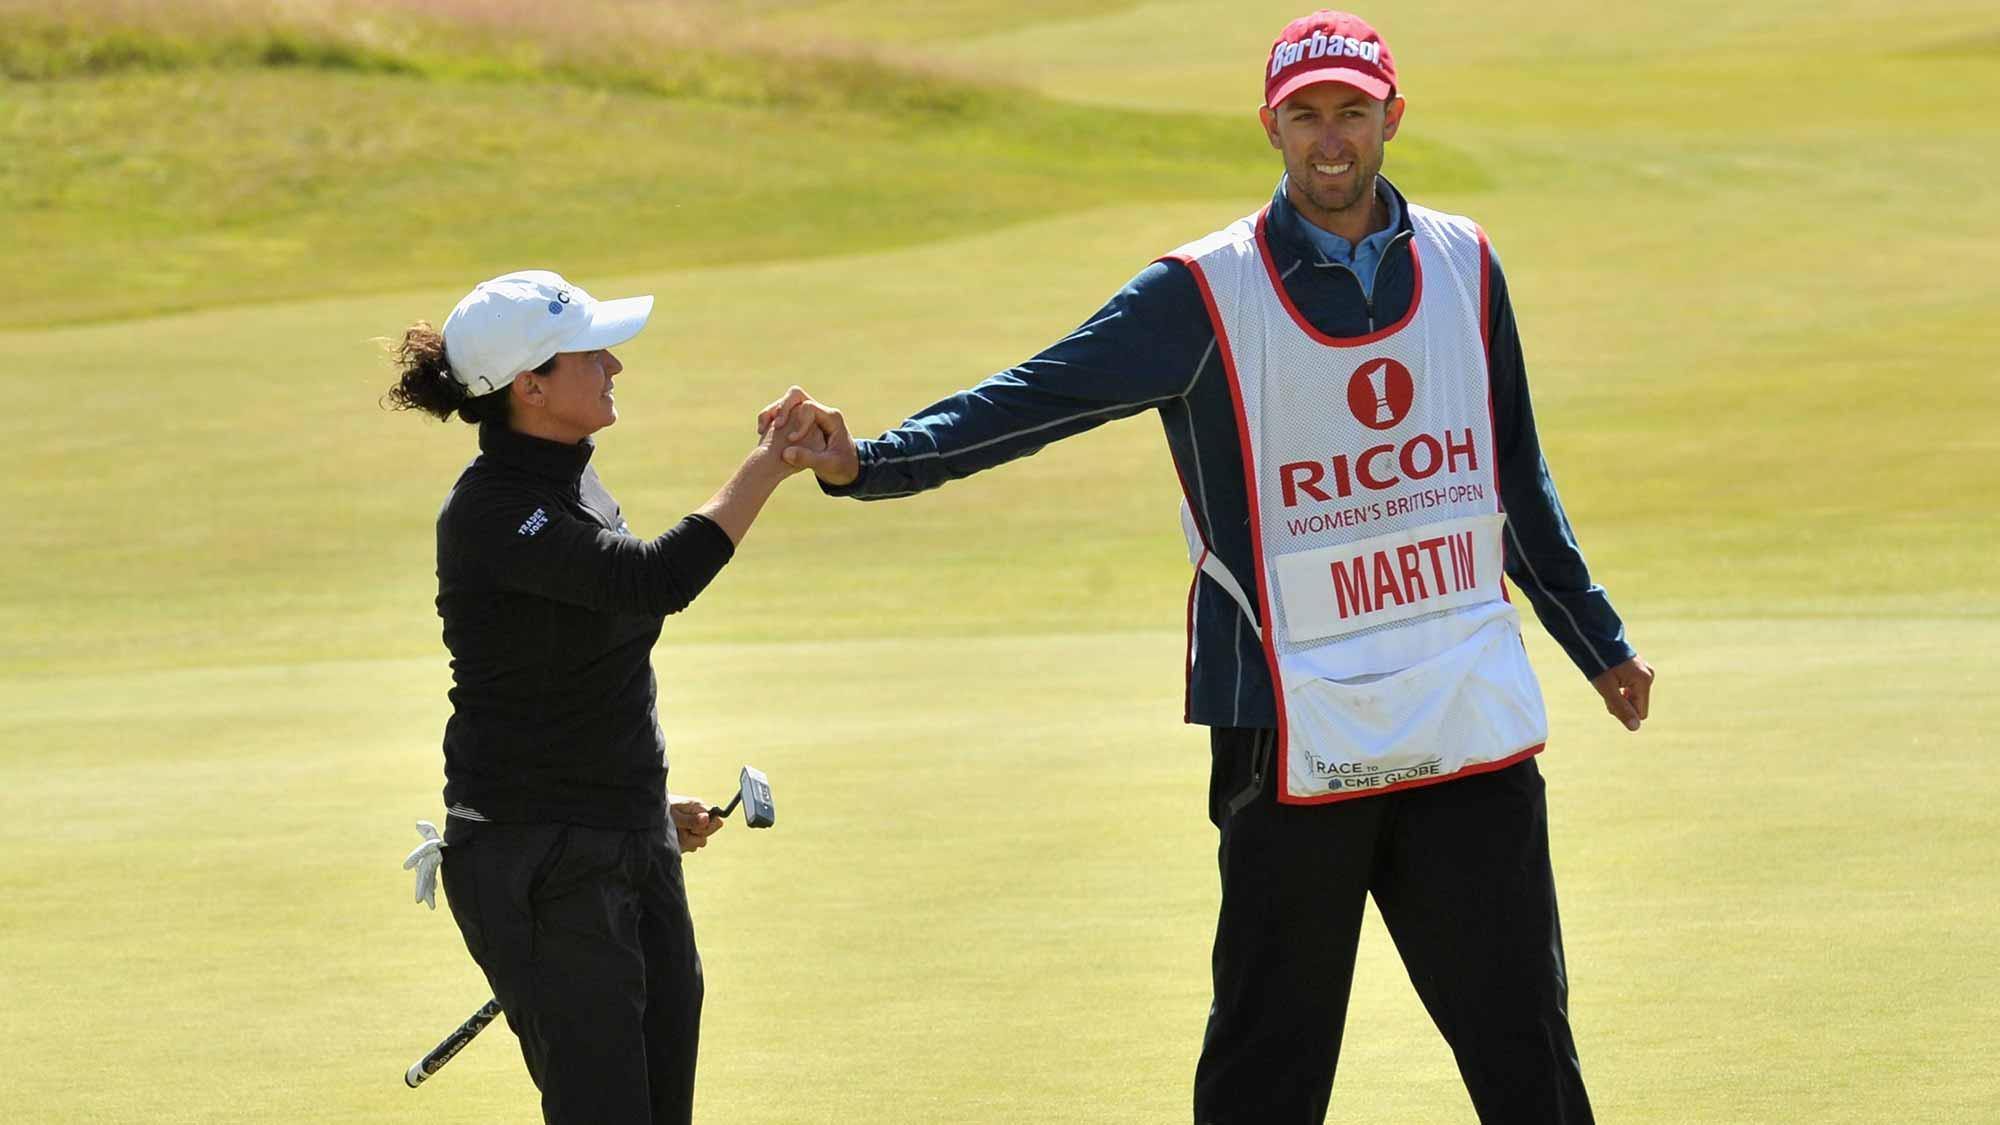 Michelle Wie withdraws mid-round from Women's British Open with wrist injury